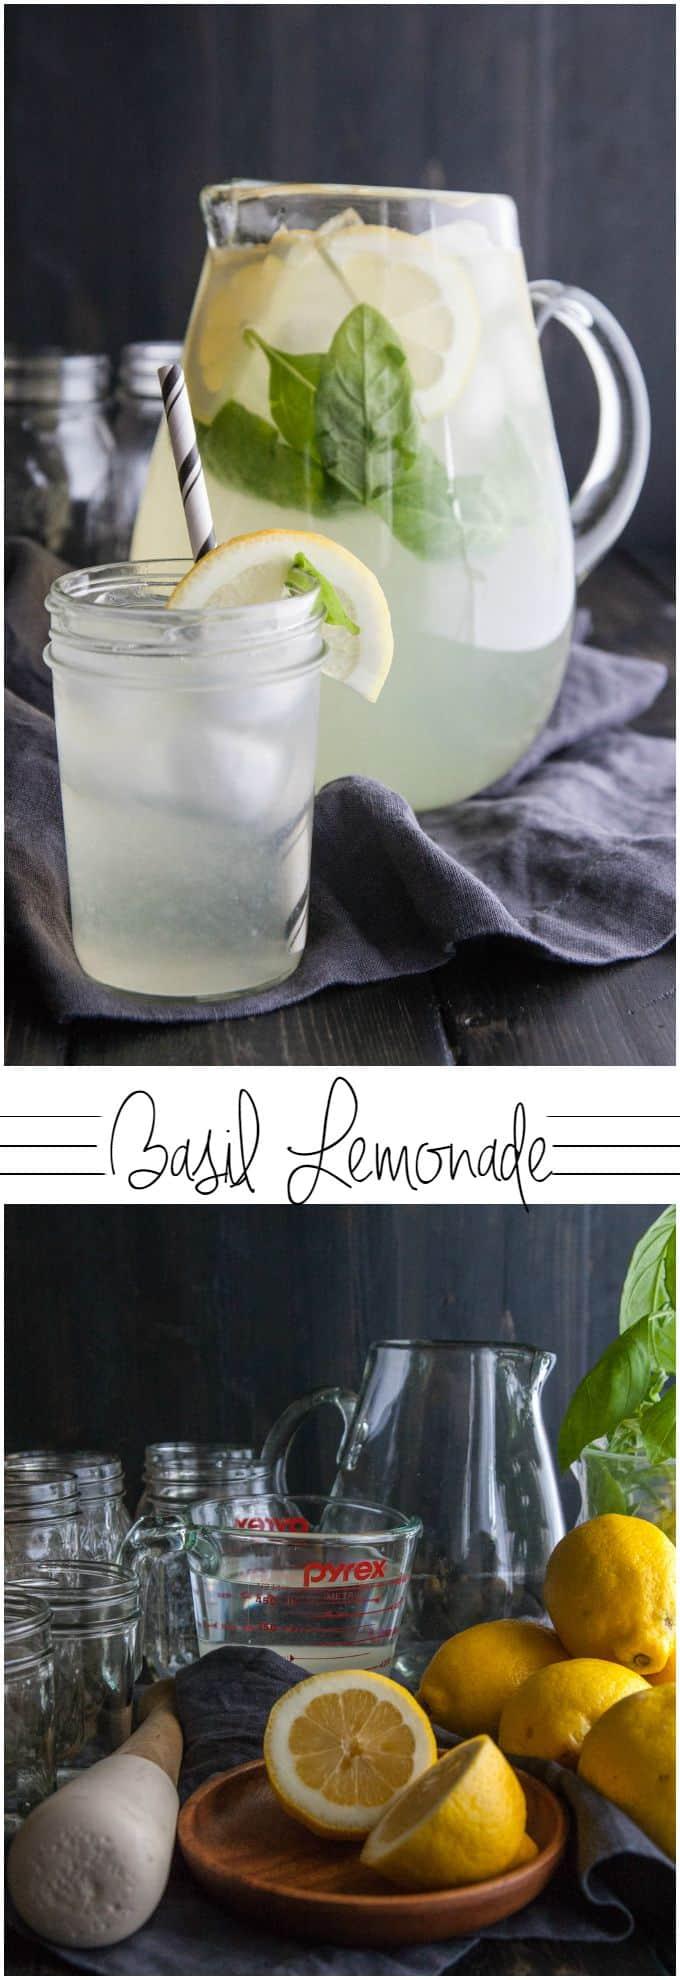 Basil lemonade from @sweetphi